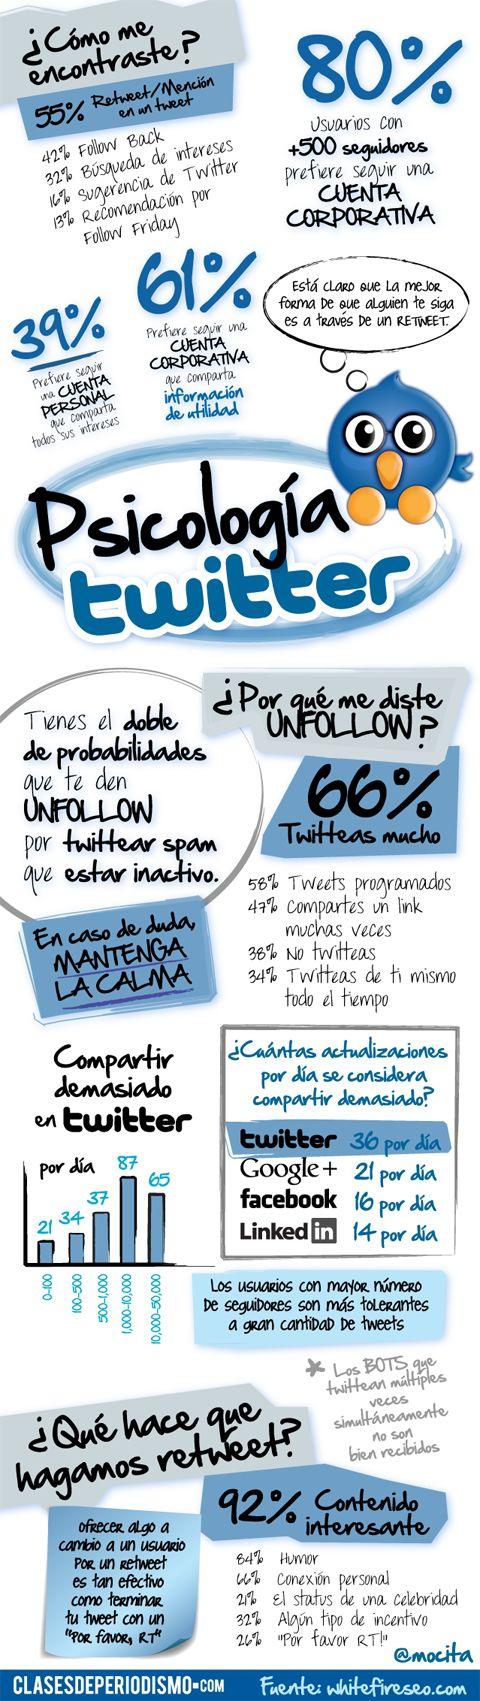 Psicologia #Twitter visto en @Cdperiodismo @Joan Carles March Cerdà ;)